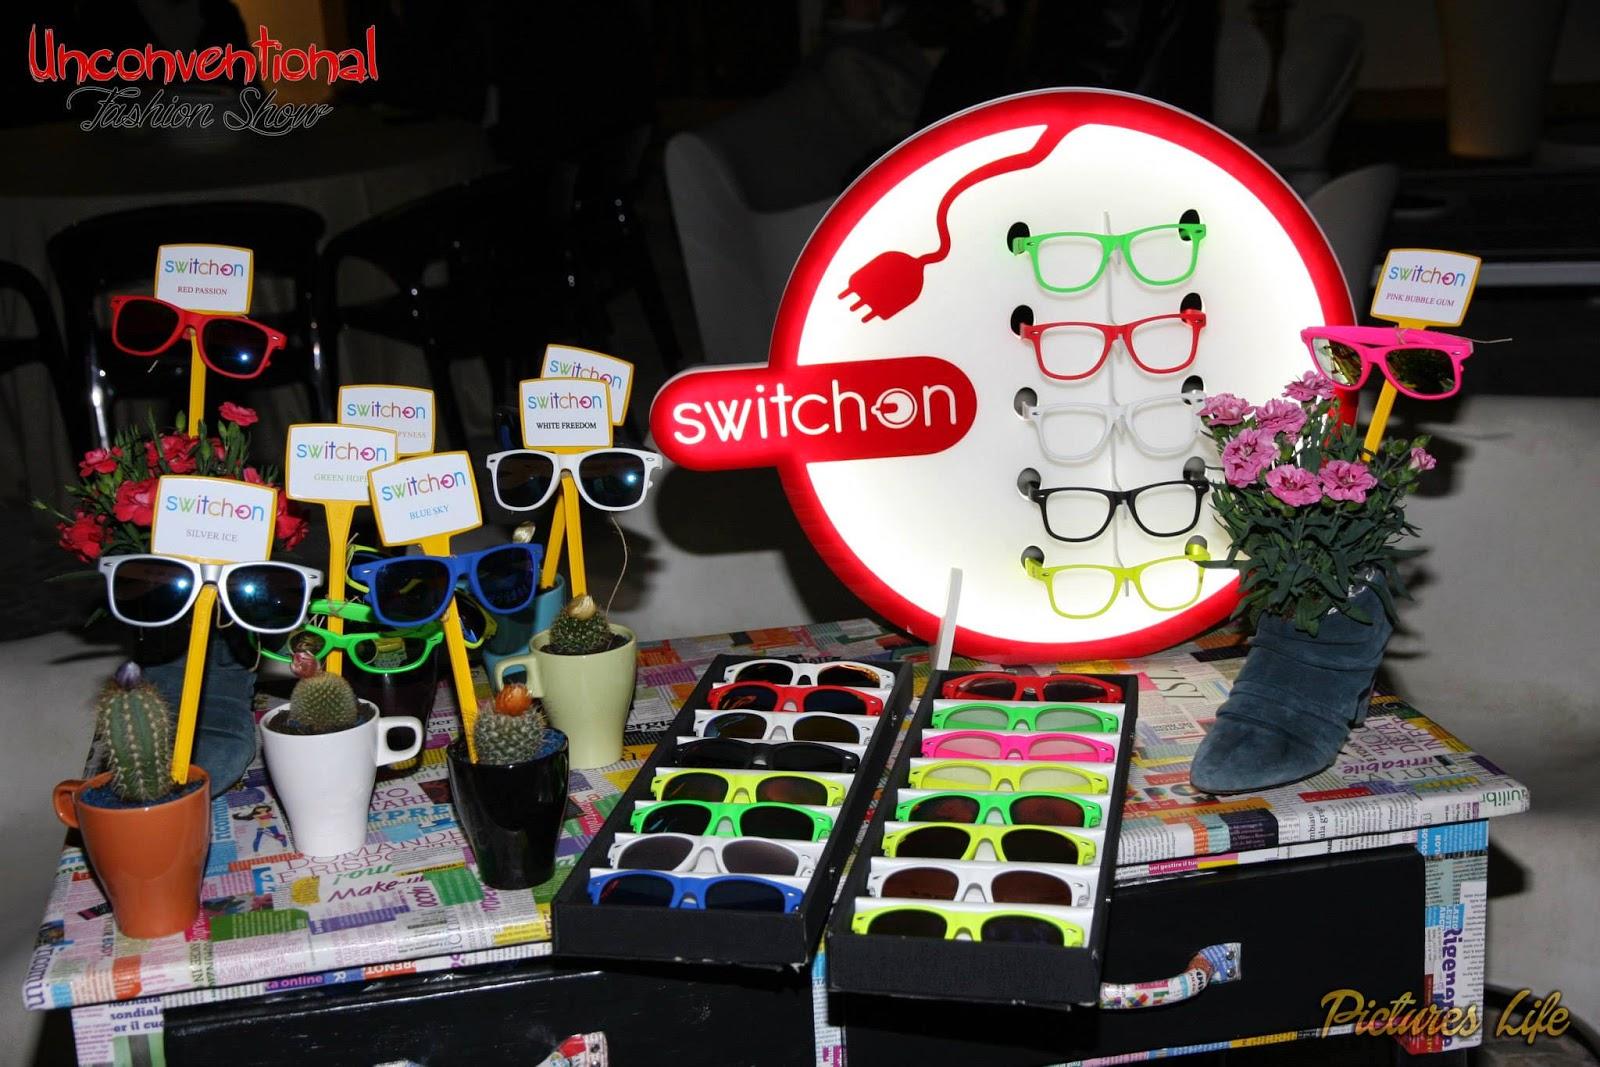 switch_on, occhiali, sunglasses, color